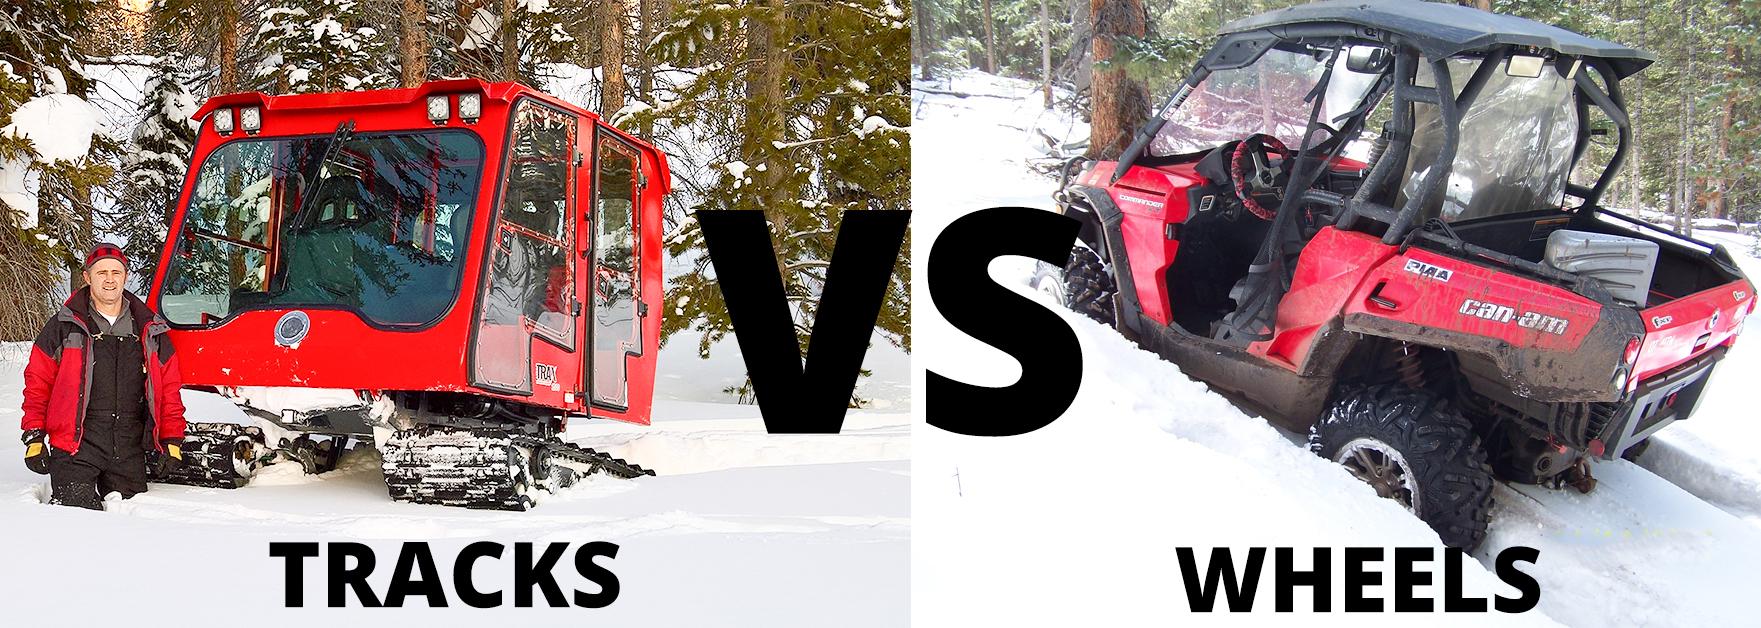 LiteTrax-tracks-vs-wheels